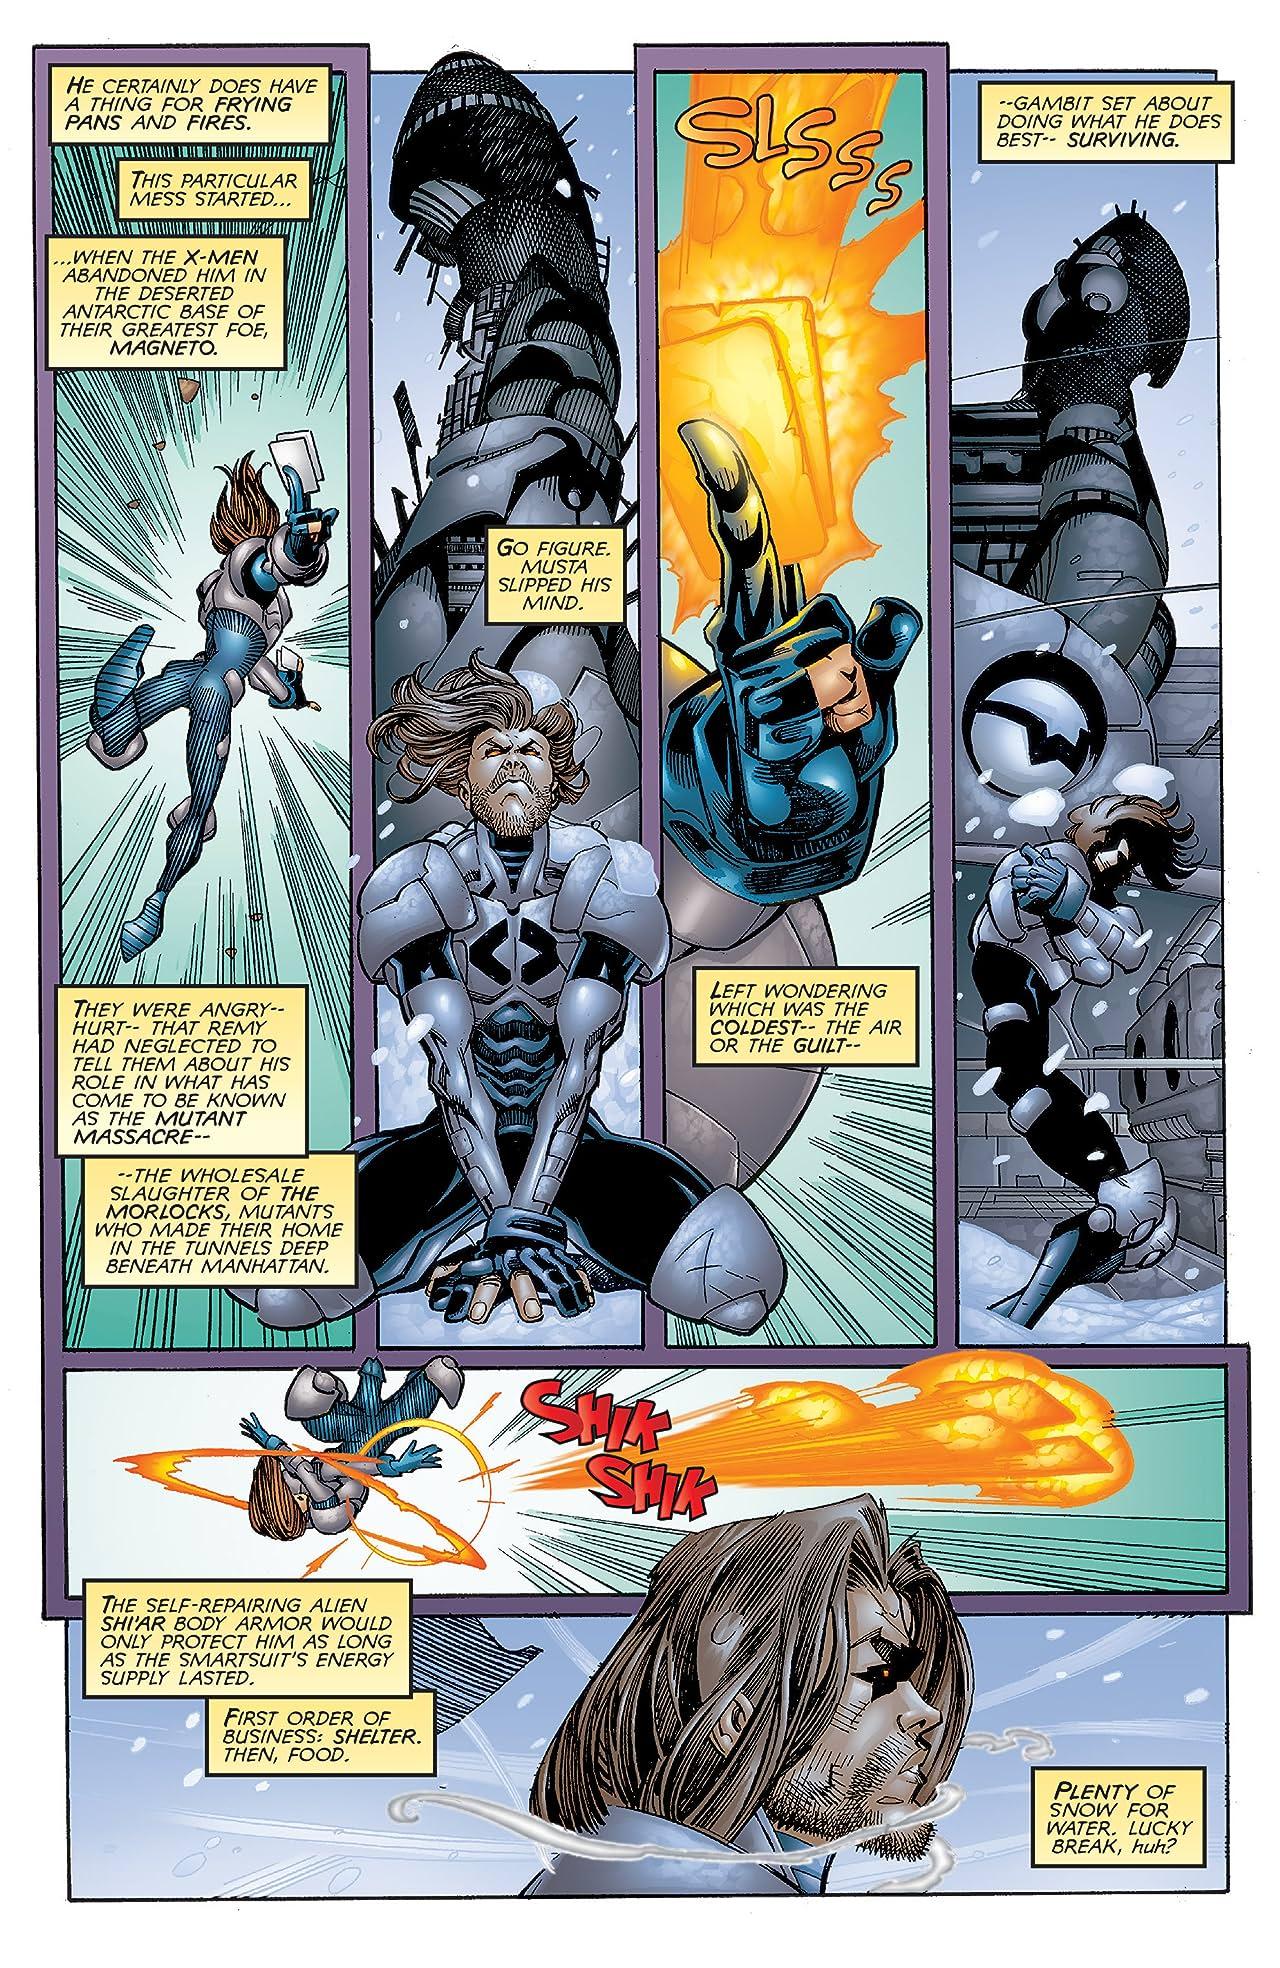 Gambit (1999-2001) #½